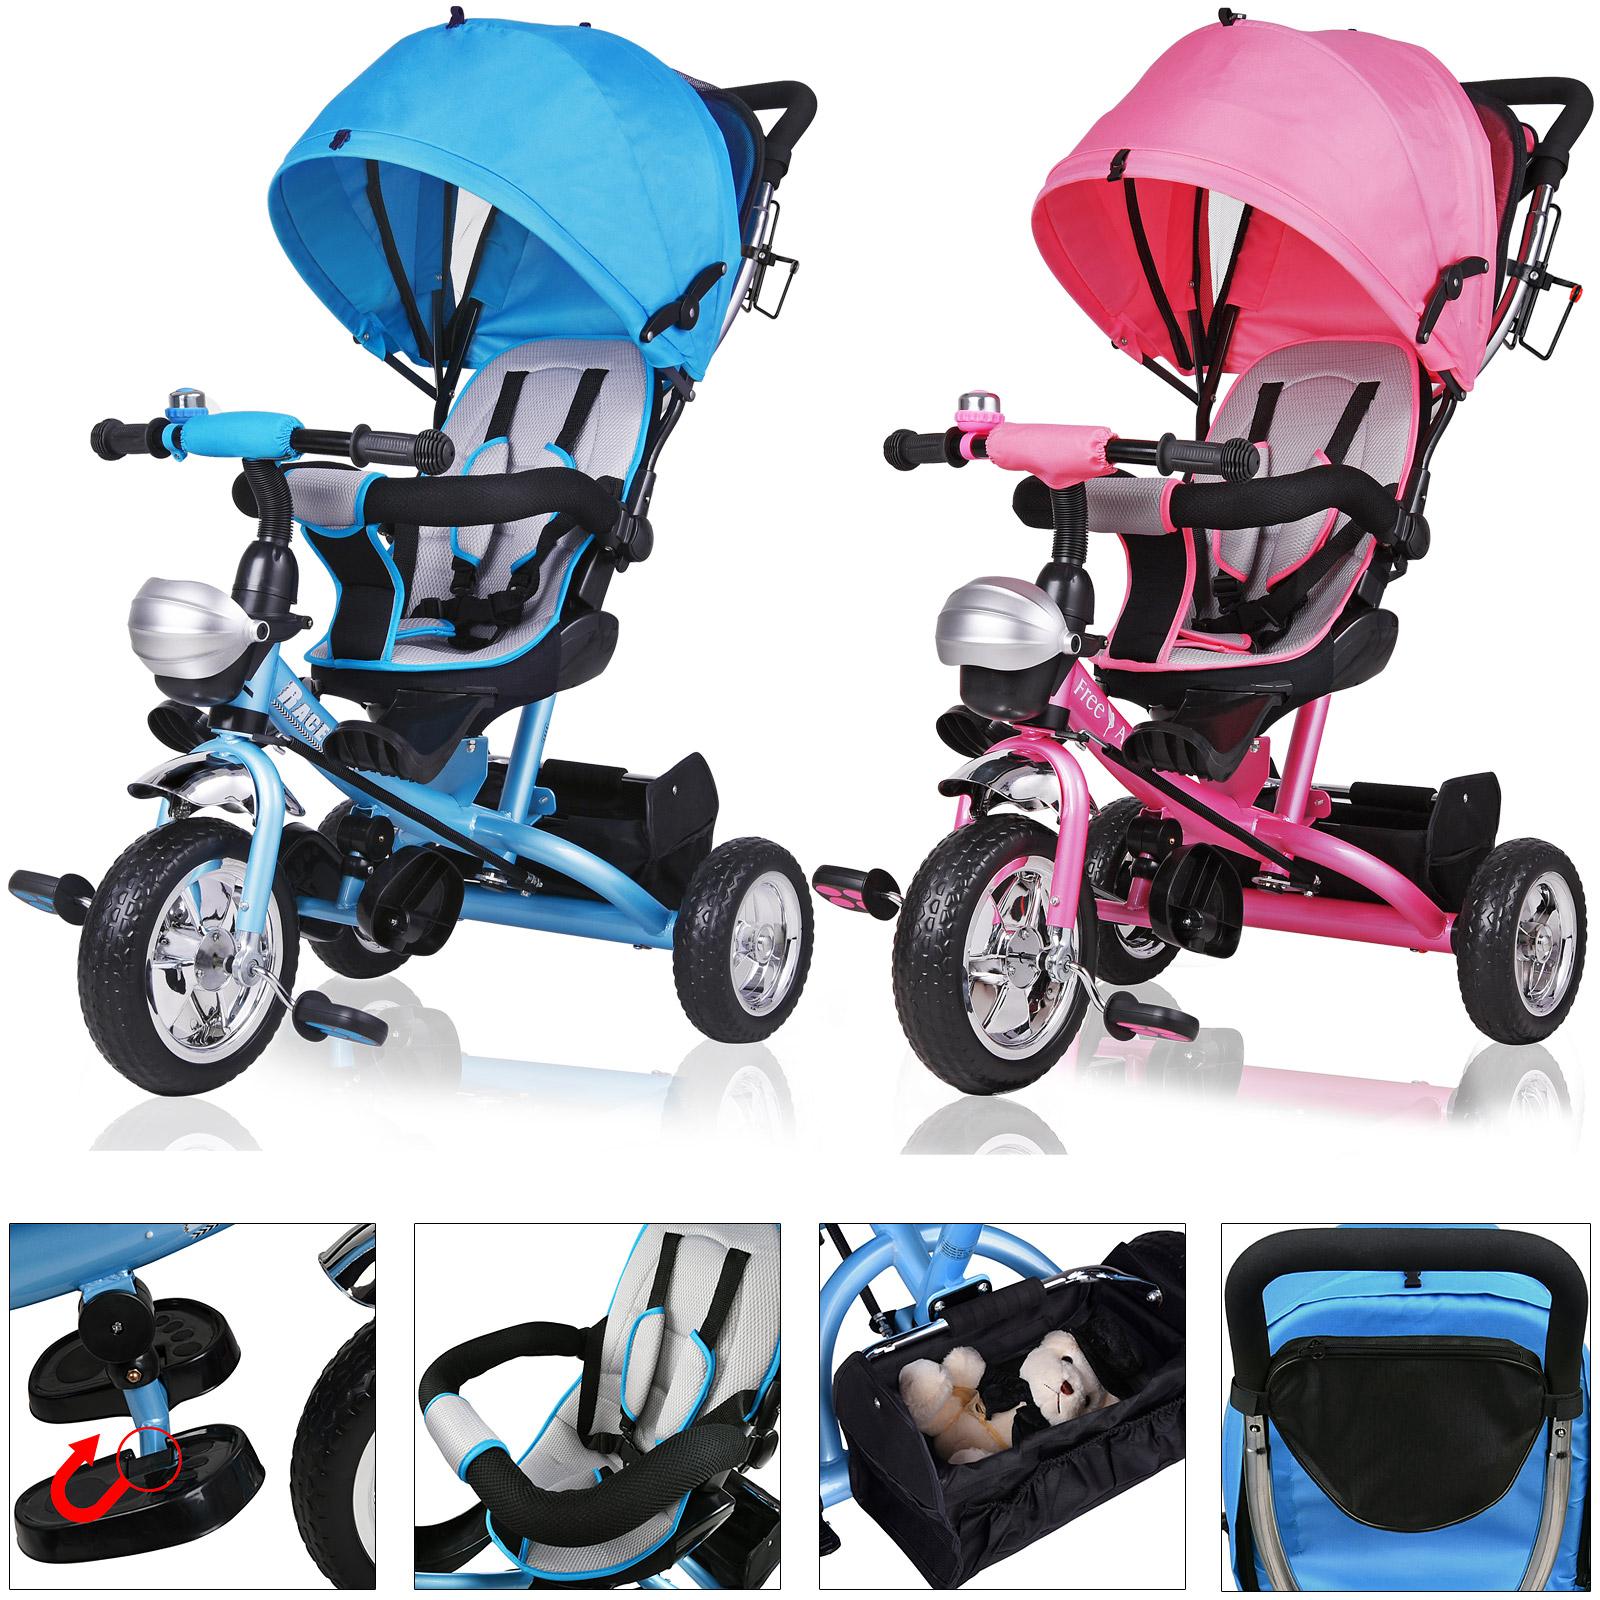 deuba dreirad kinderdreirad kinder lenkstange dach fahrrad baby kinderwagen ebay. Black Bedroom Furniture Sets. Home Design Ideas